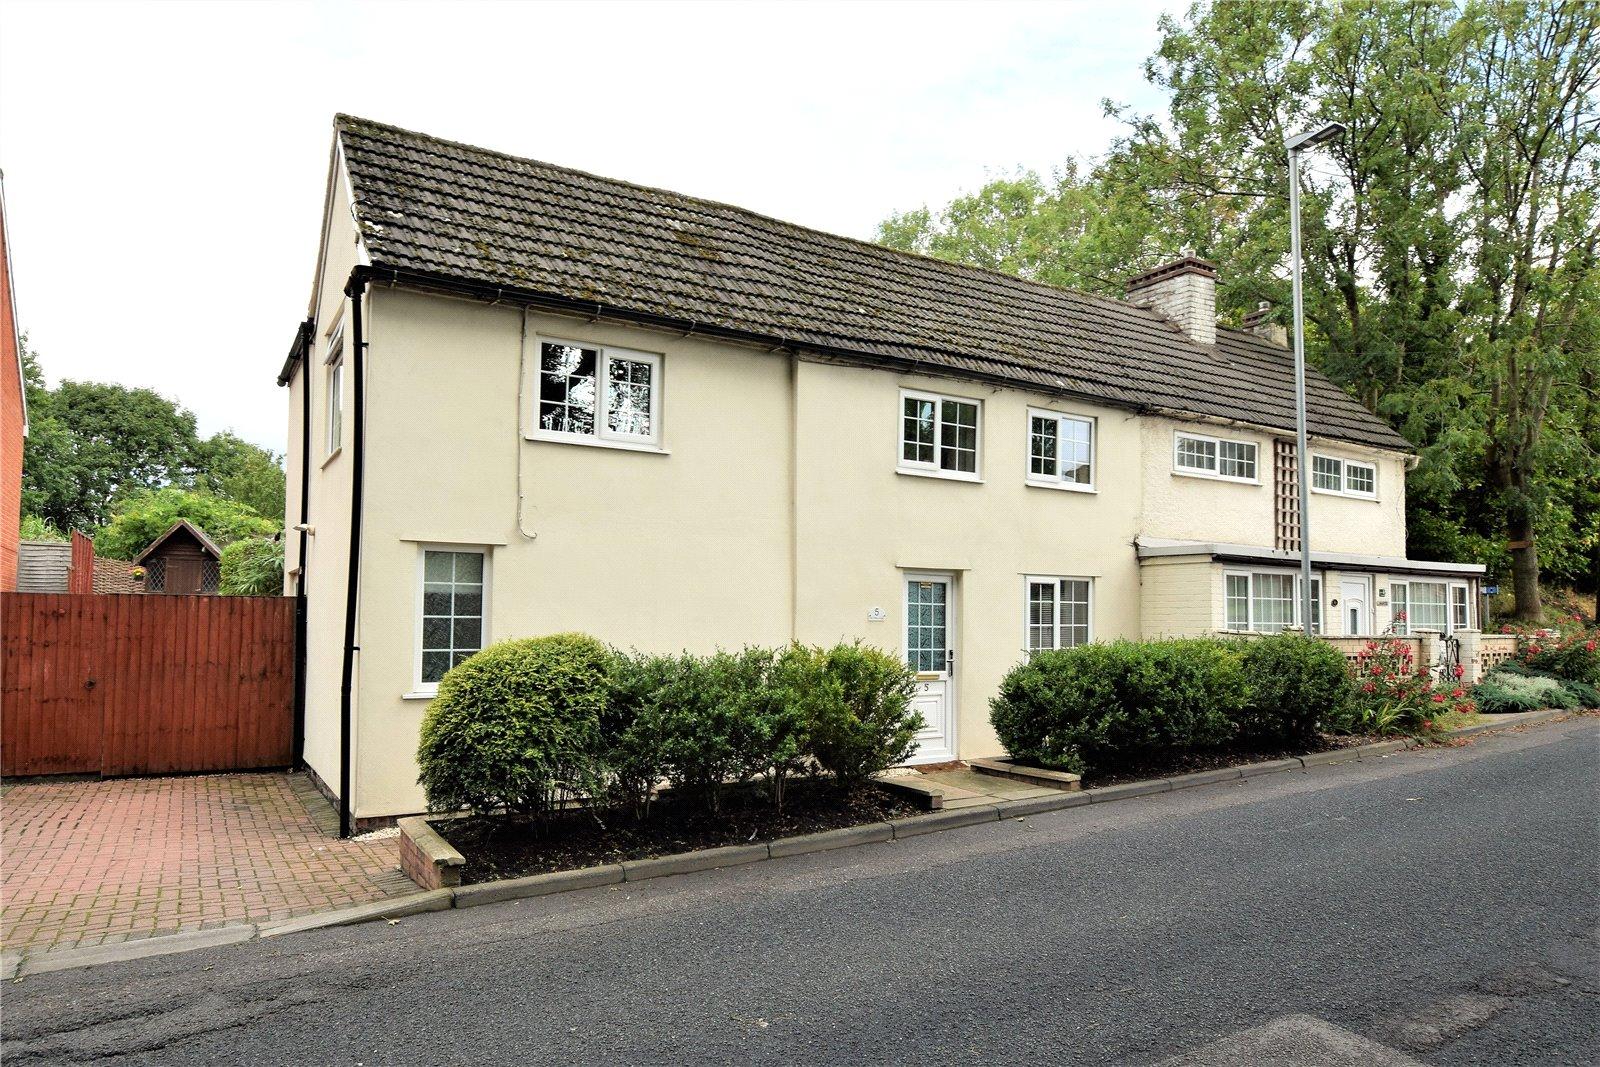 5 Old Office Road, Dawley, Telford, Shropshire, TF4